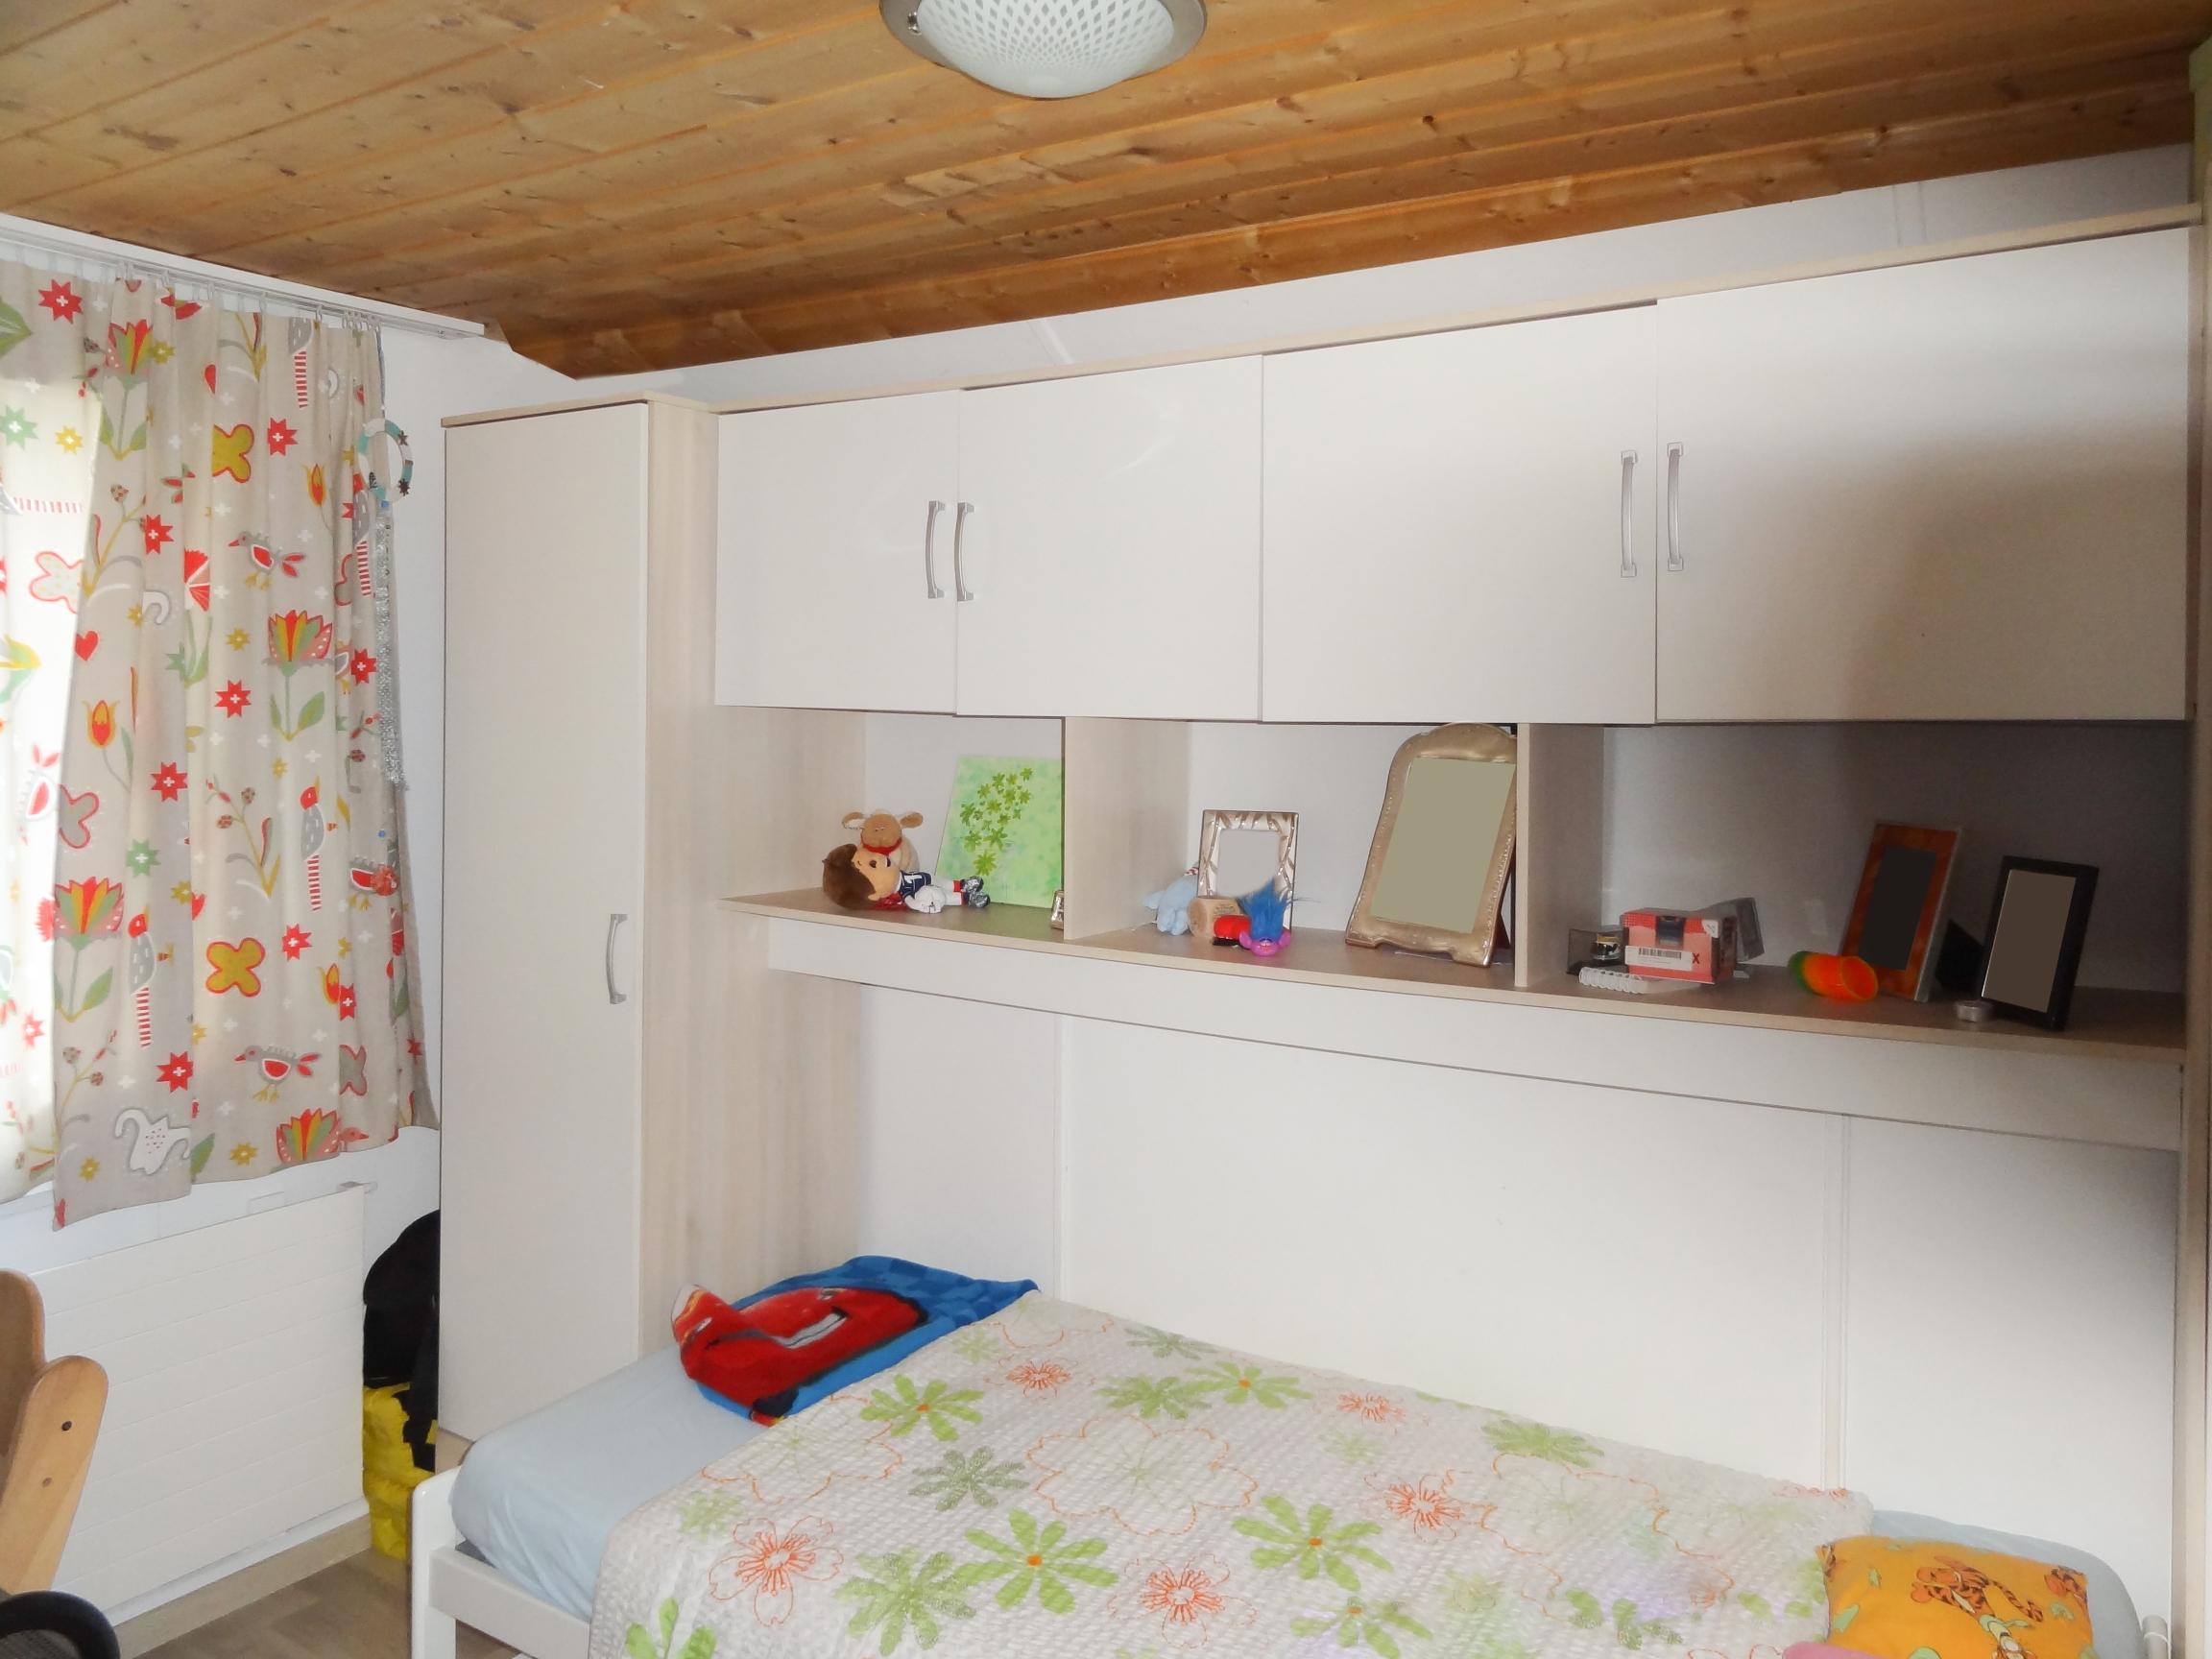 Kinderzimmer 1_resized_20190515_095808744.jpg